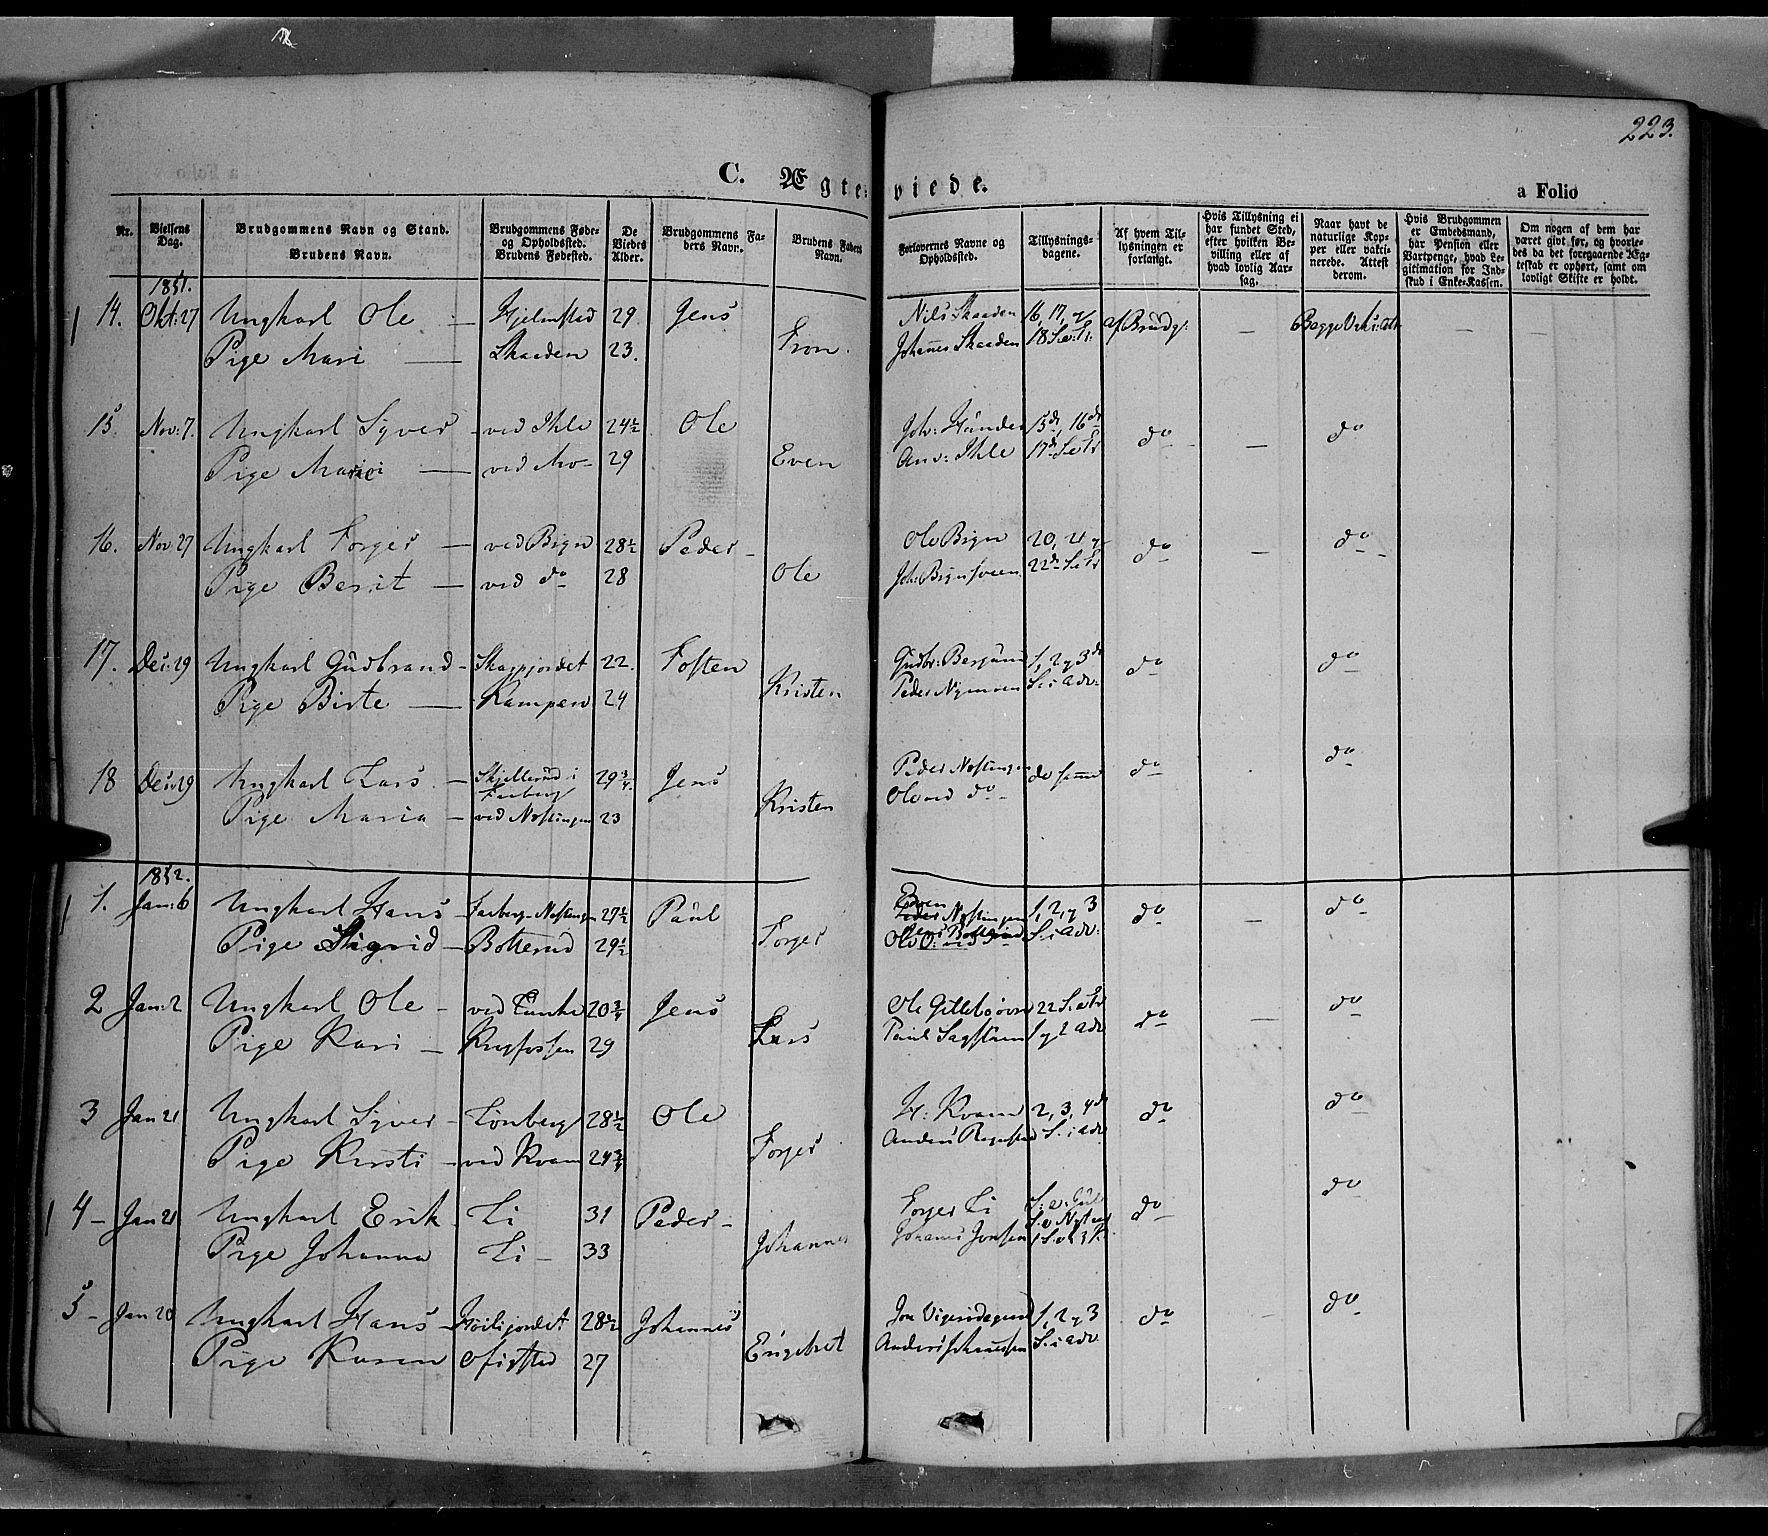 SAH, Øyer prestekontor, Ministerialbok nr. 5, 1842-1857, s. 223